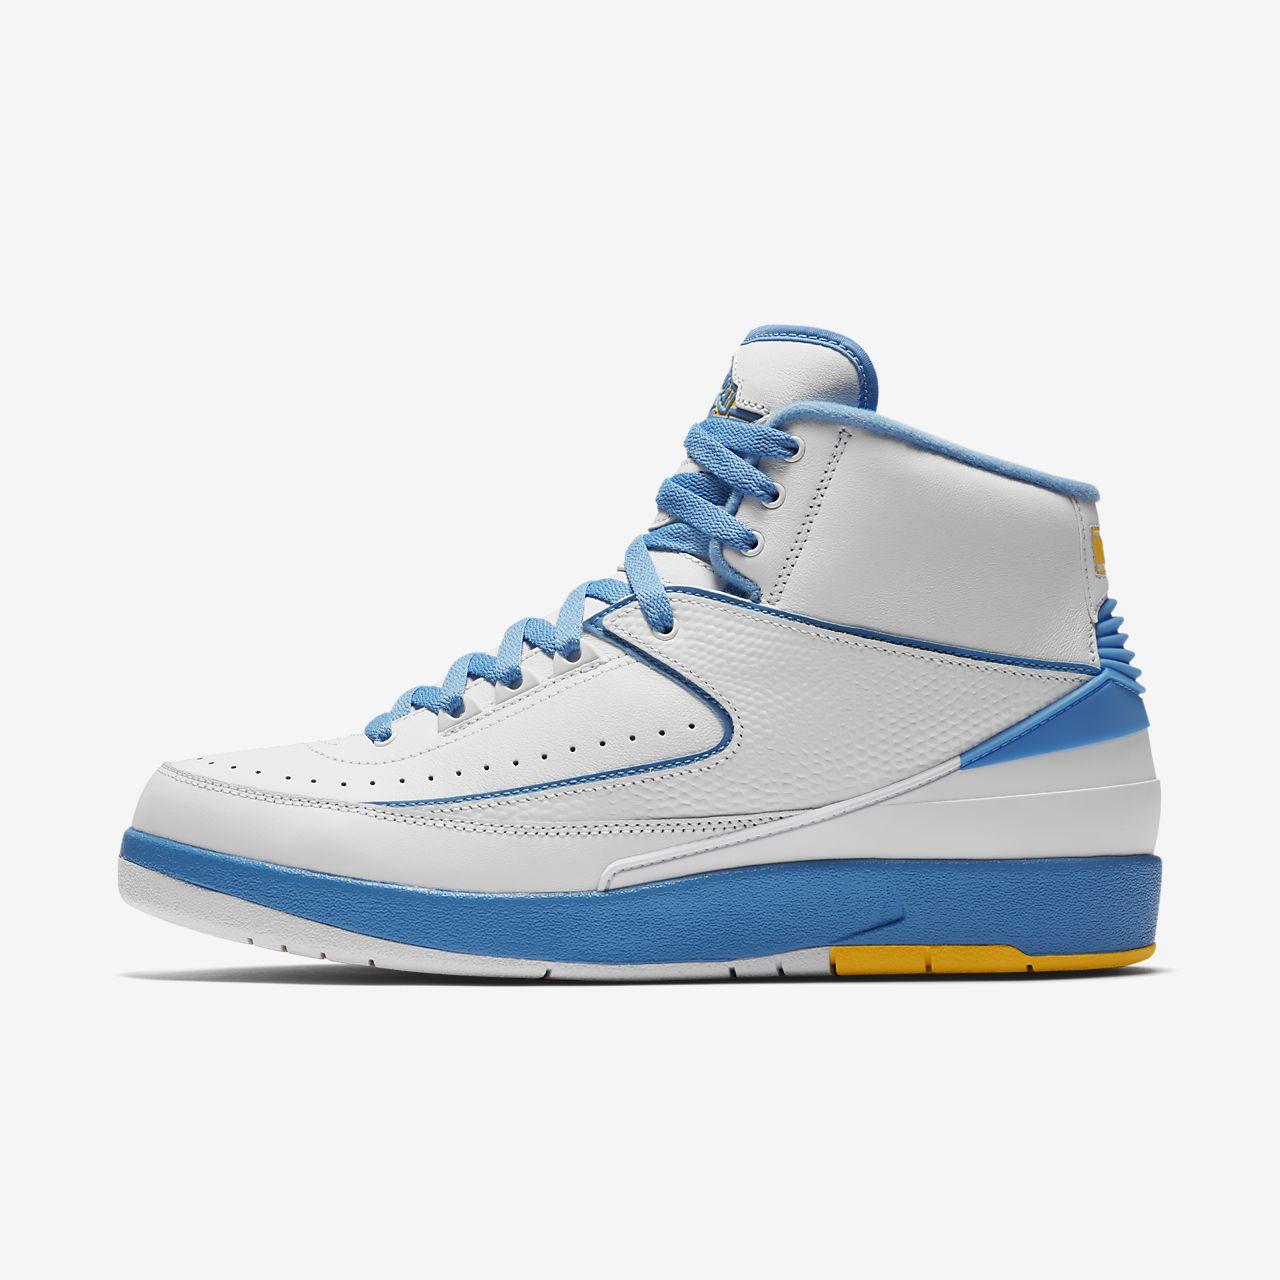 Chaussures Nike Air Jordan 2 Retro BWL9e